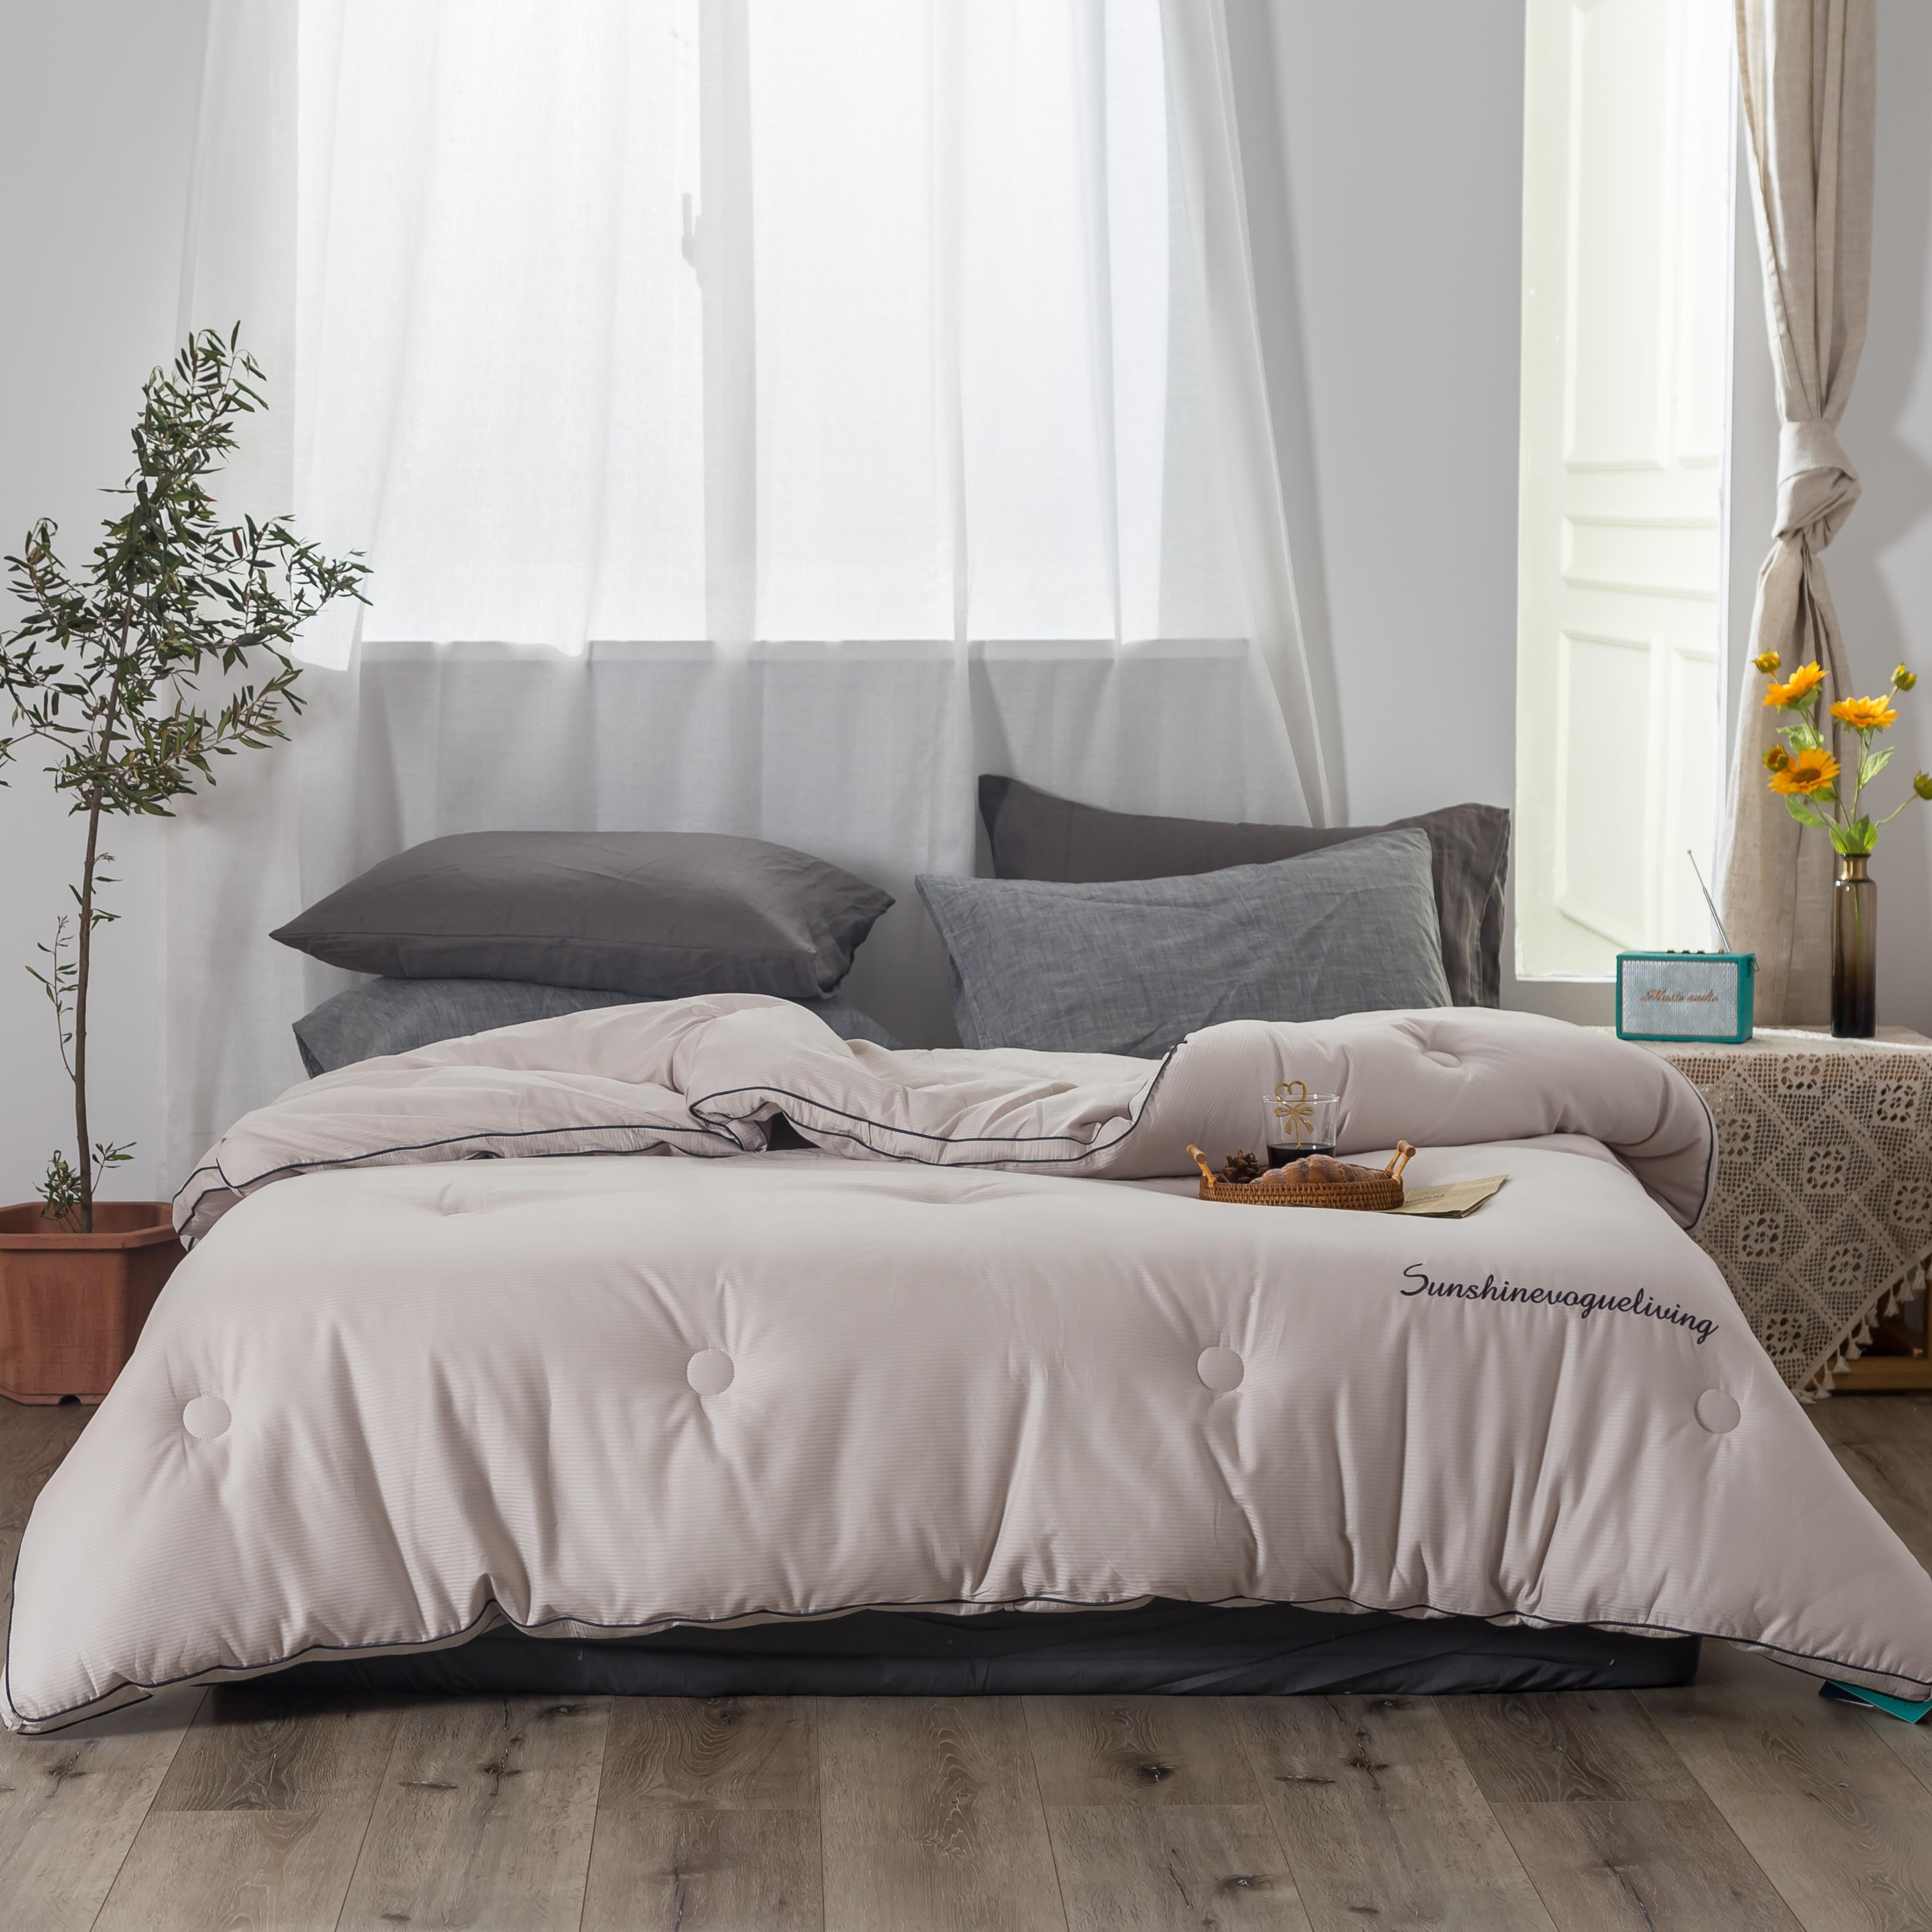 Blancstar Winter Silk Quilt 100 Cotton Comforter Cotton Cover Pink Duvet Filling Comforter Blanket in Quilts from Home Garden